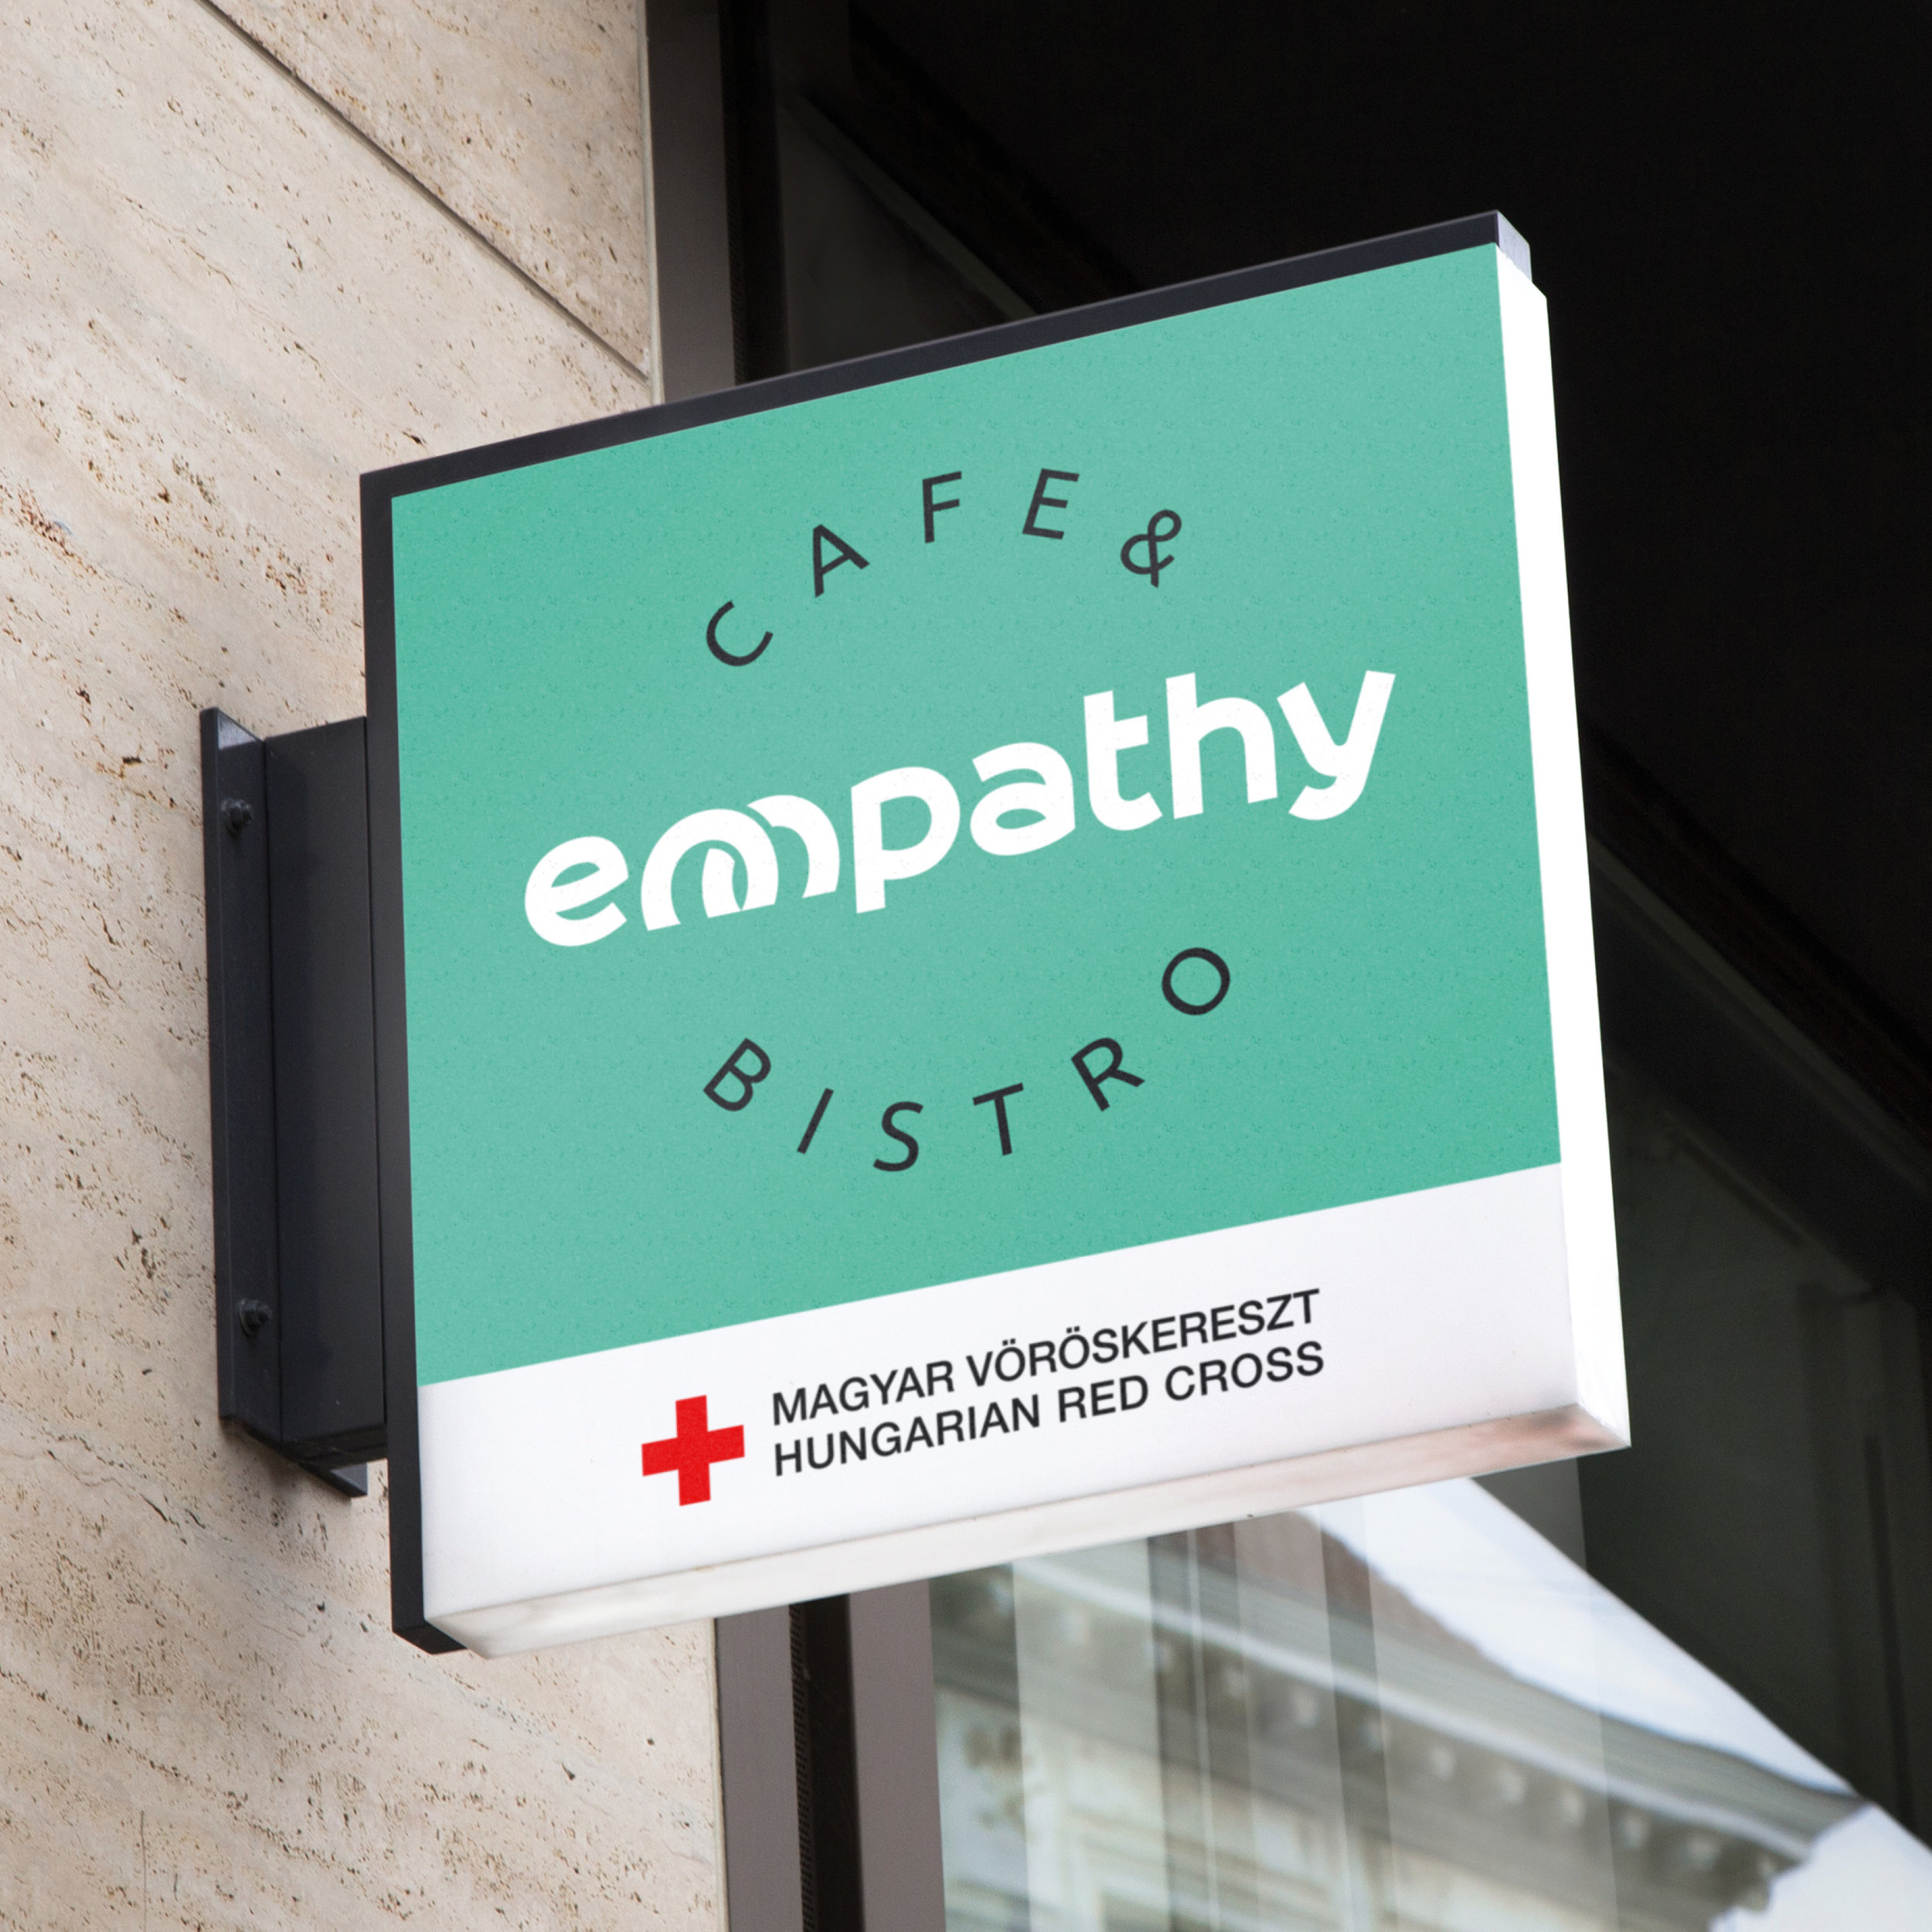 Empathy Cafe & Bistro